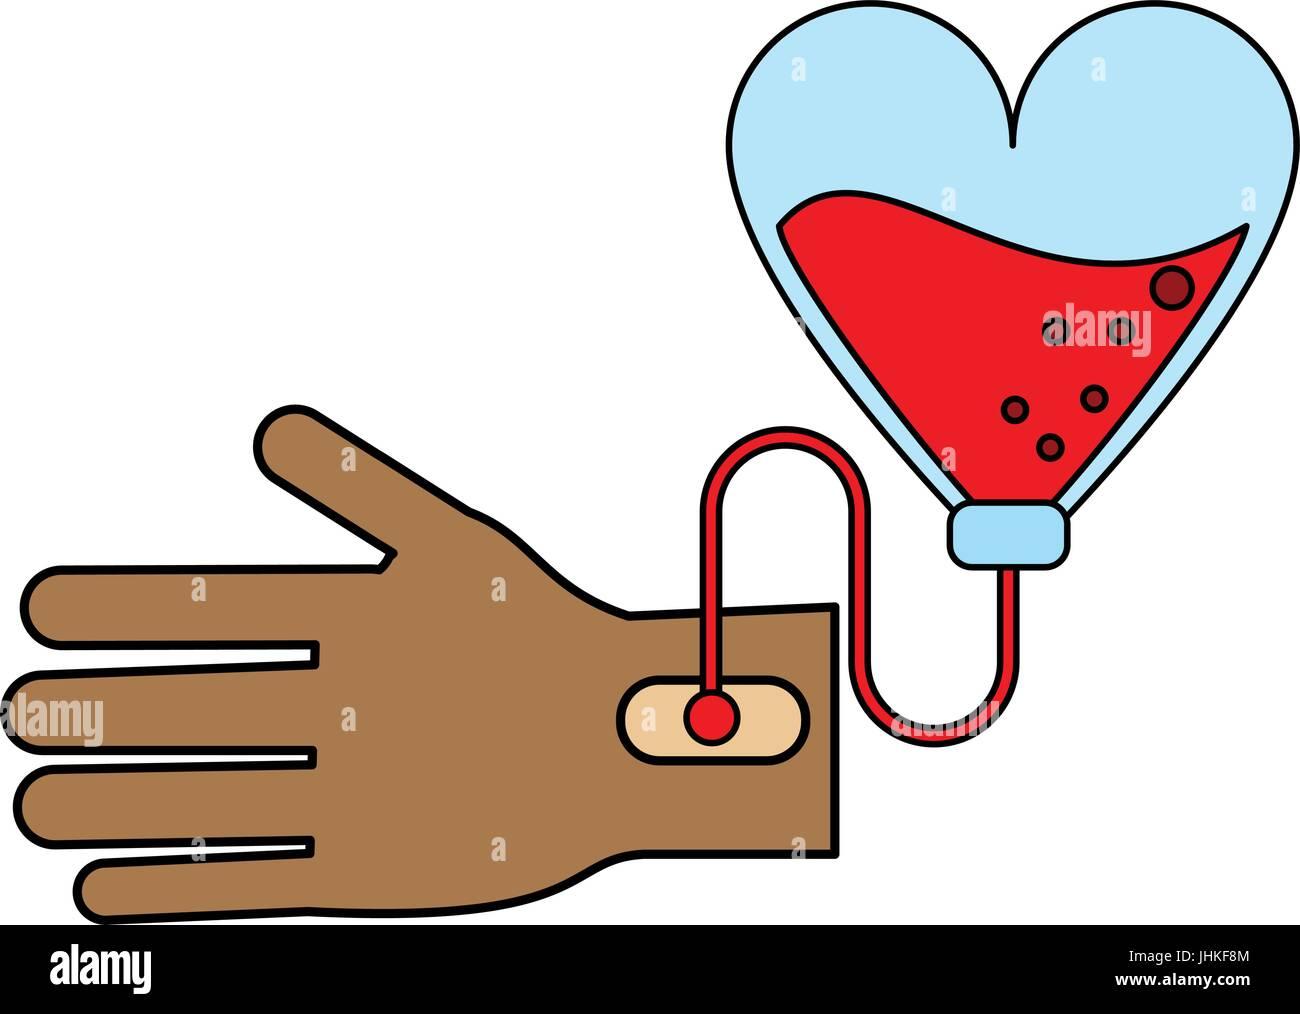 transfusion vector illustration - Stock Image